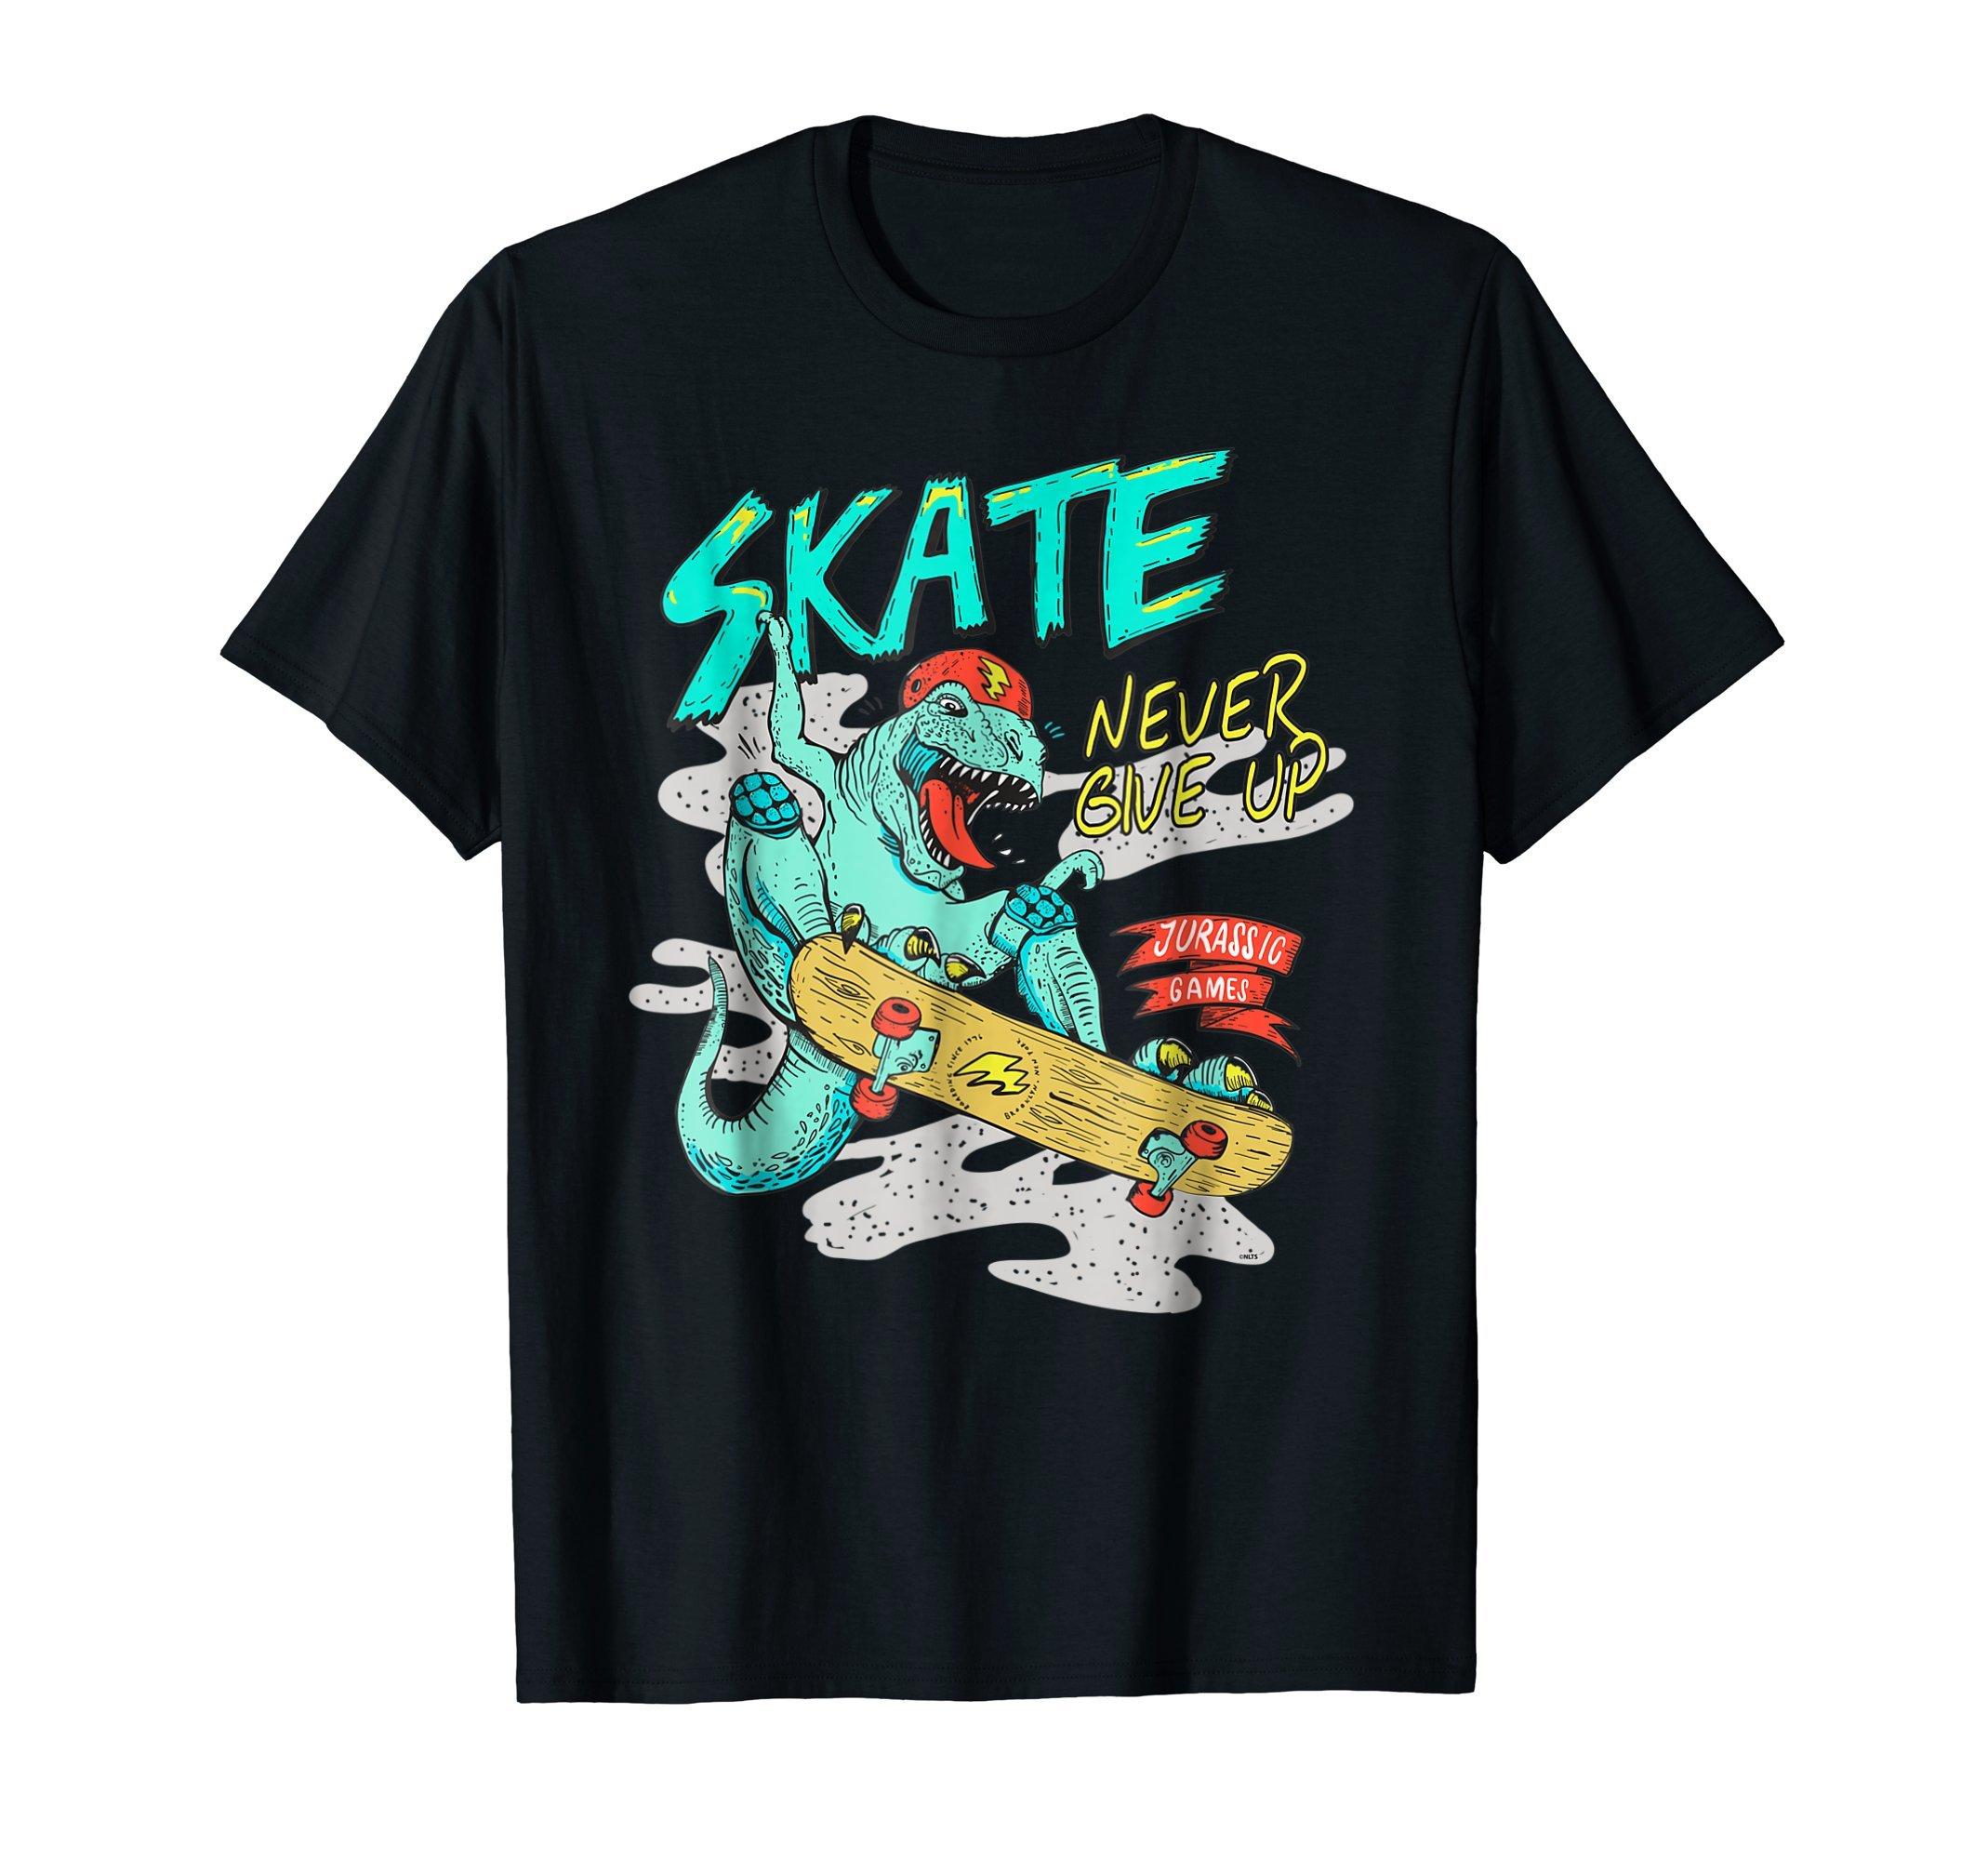 Jurassic-Games-Dinosaur-Skater-Fun-Humor-T-Shirt-Tee